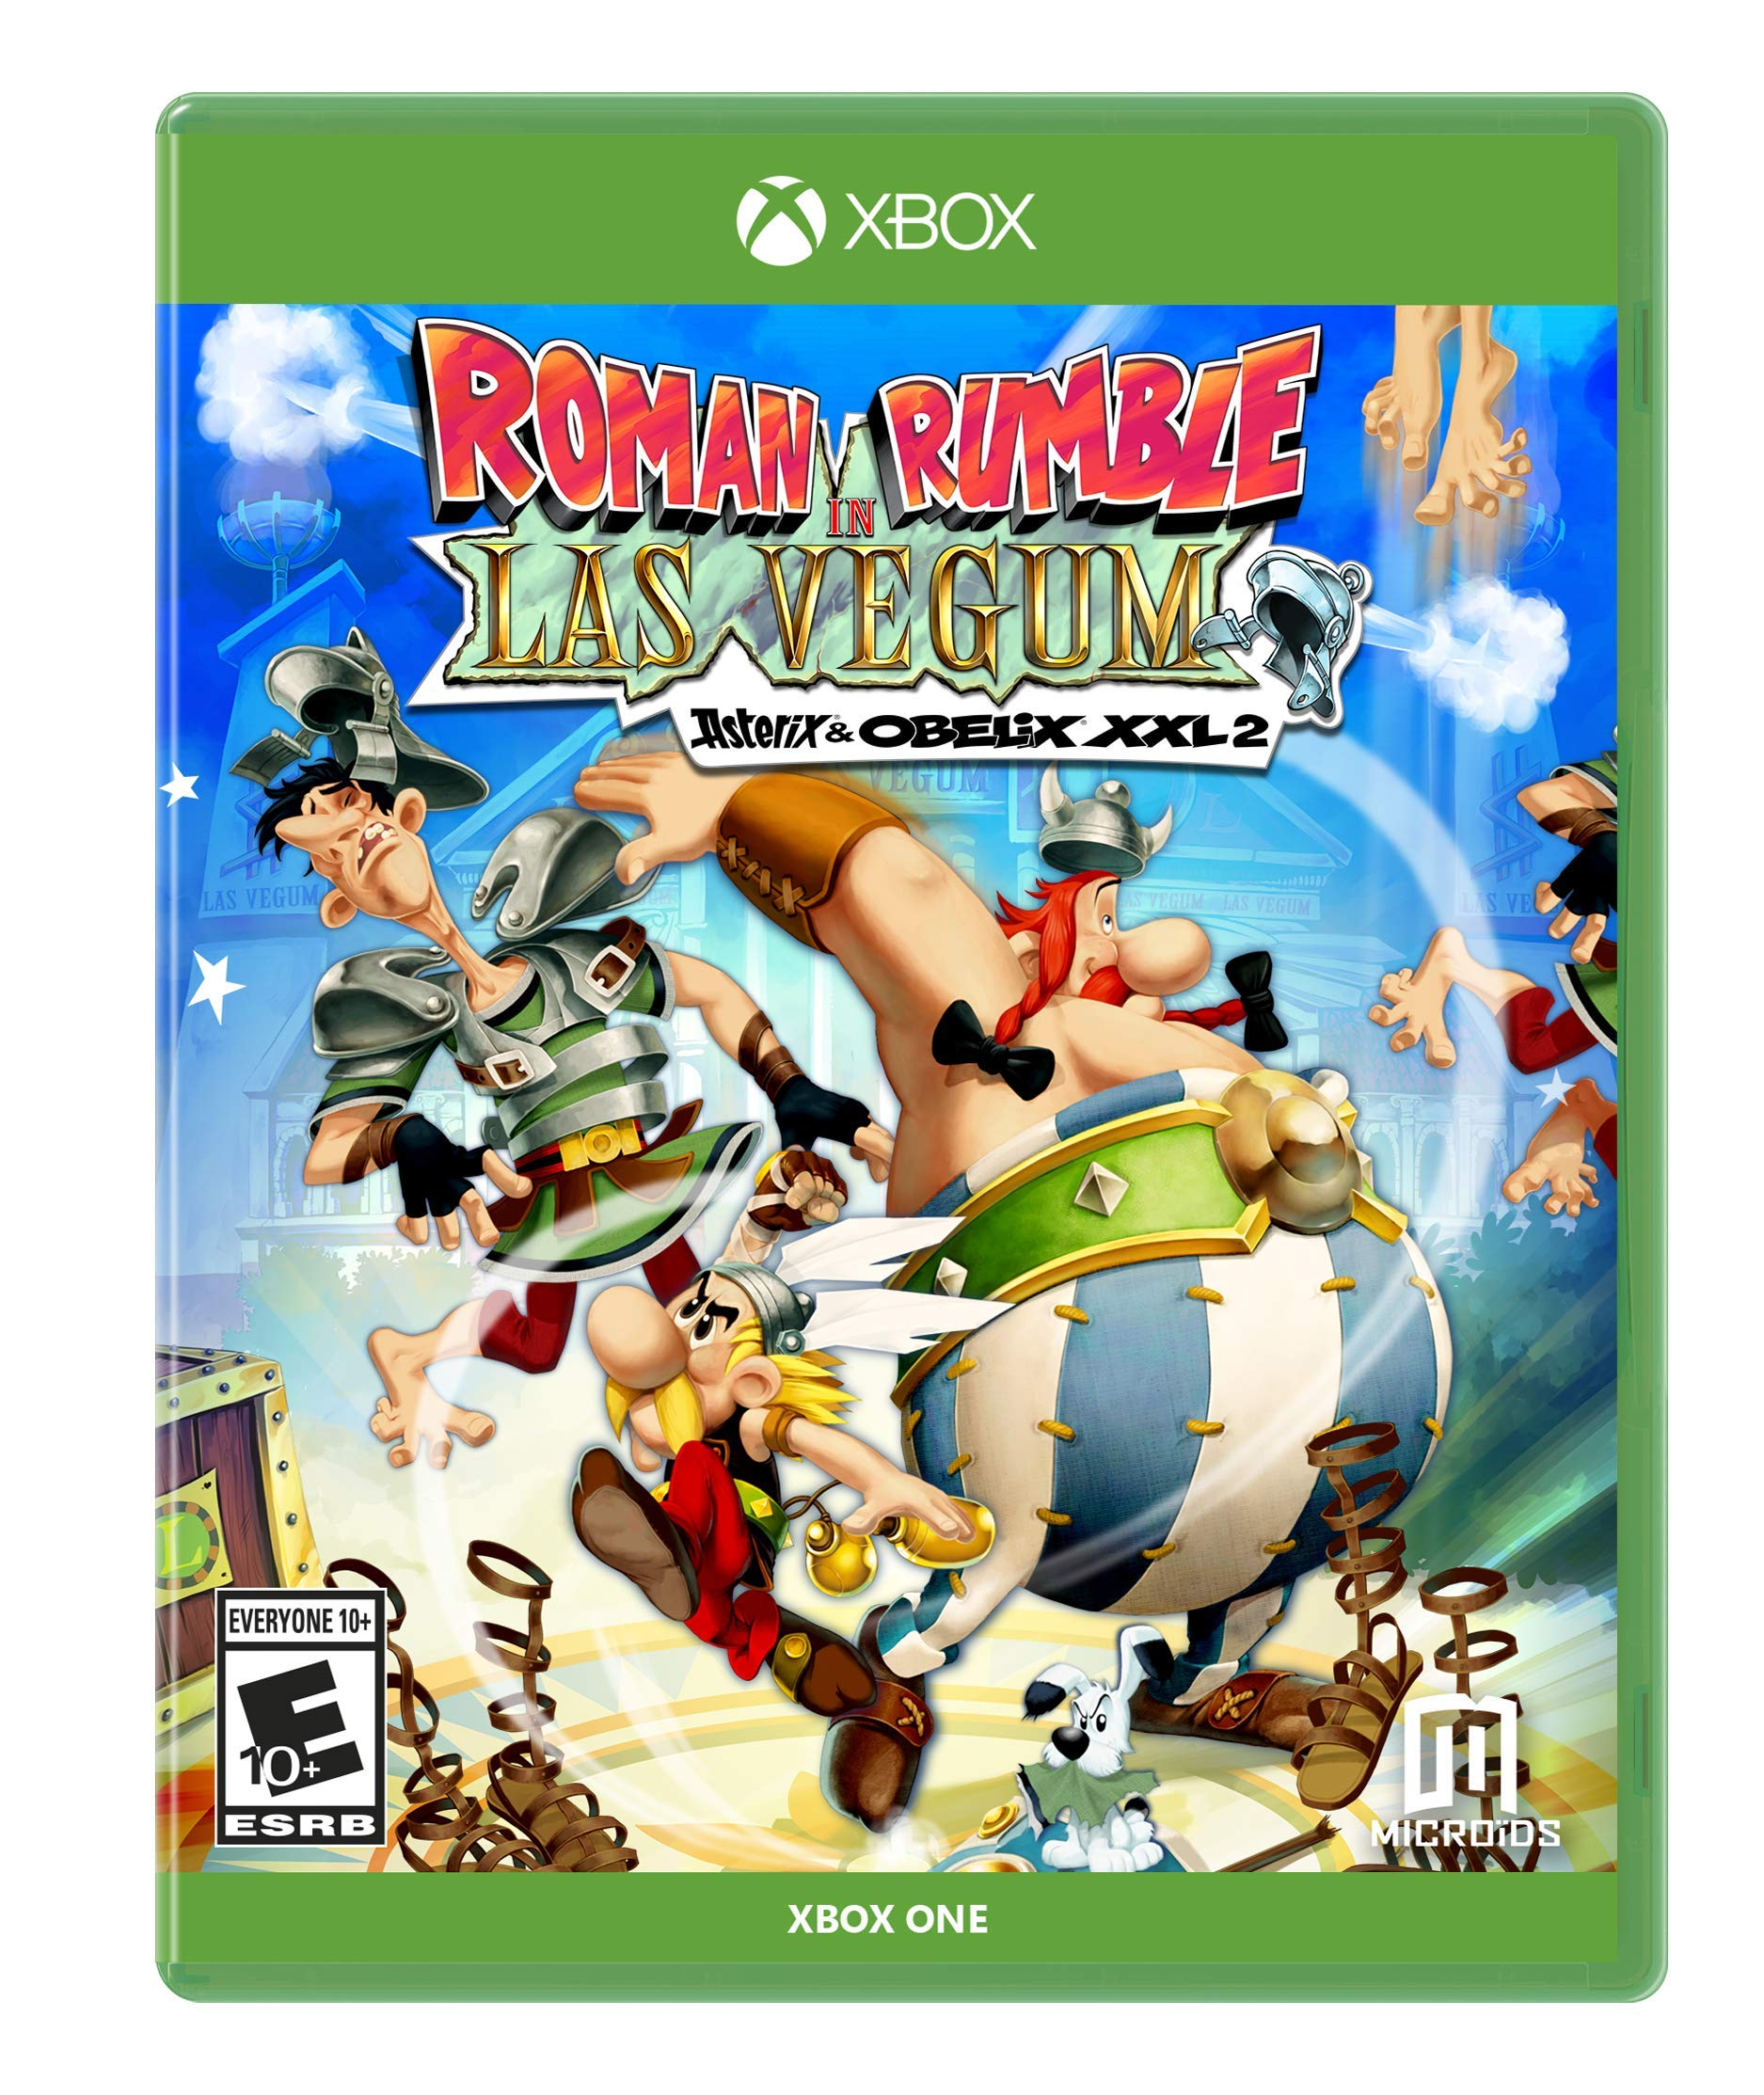 Roman Rumble In Las Vegum: Asterix & Obelix XXL 2 (XB1) - Xbox One